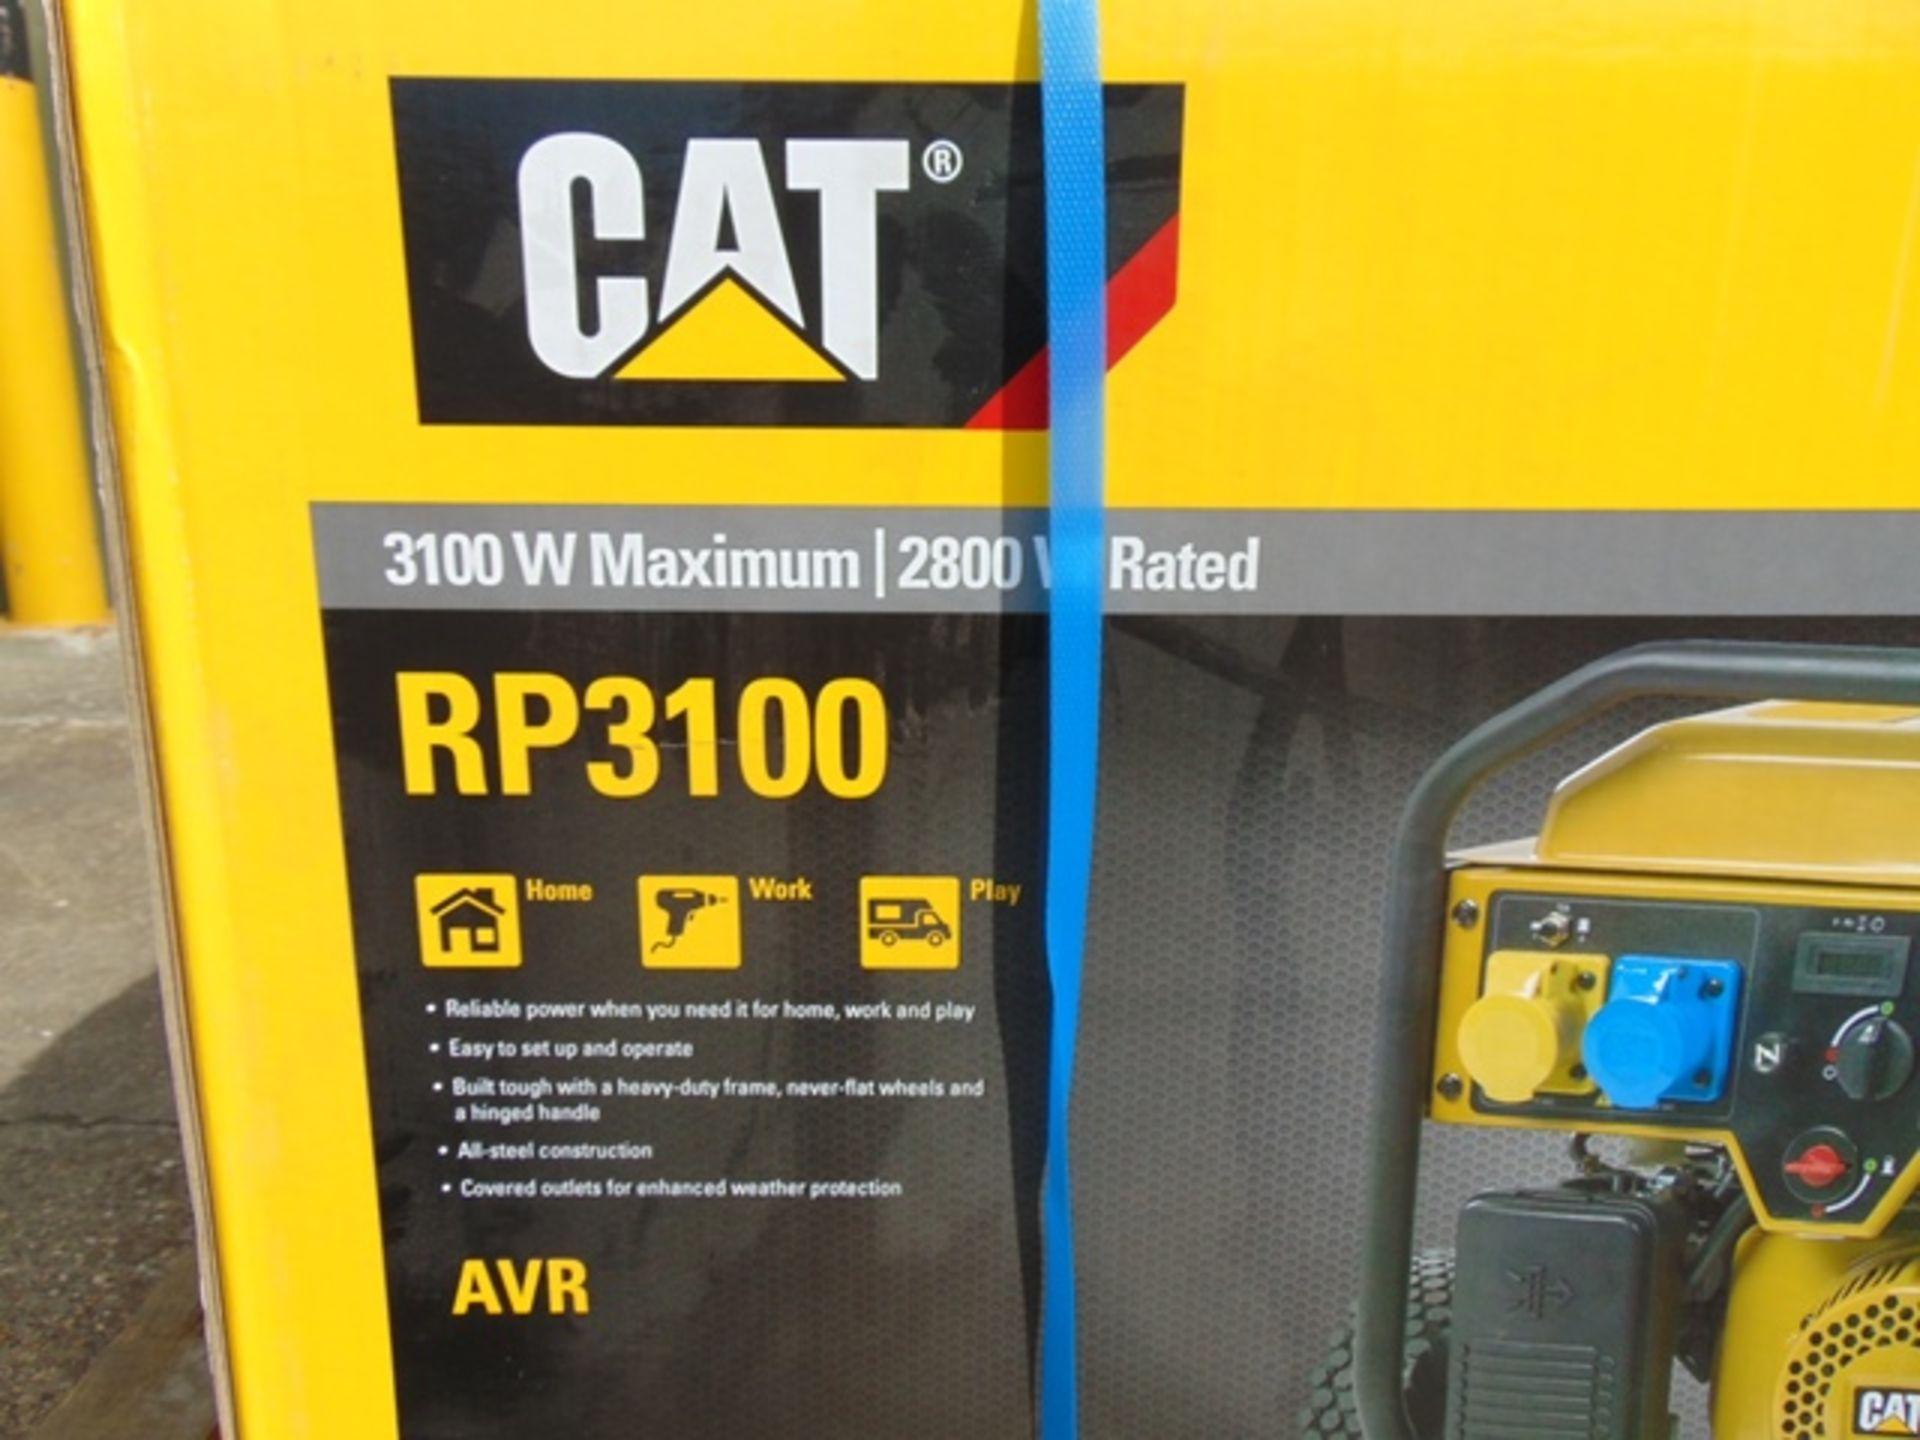 Lot 28 - UNISSUED Caterpillar RP3100 industrial Petrol Generator Set